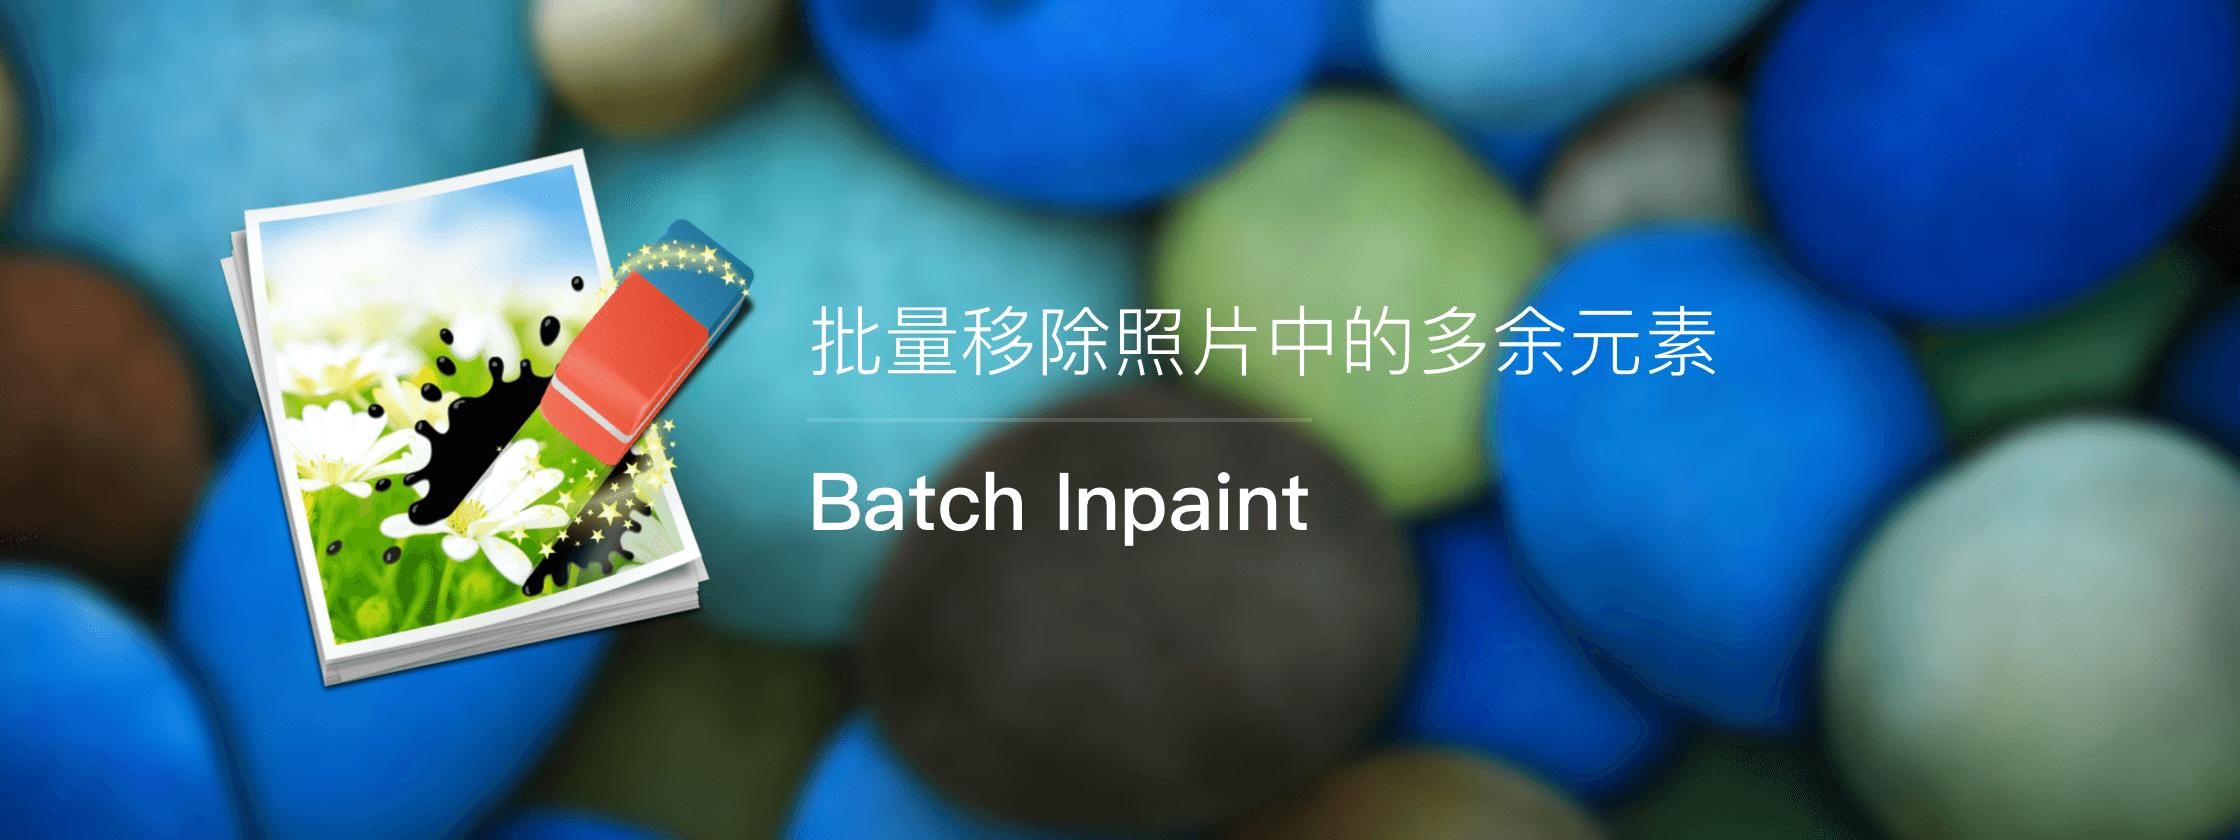 Batch Inpaint – 批量移除照片中的多余元素